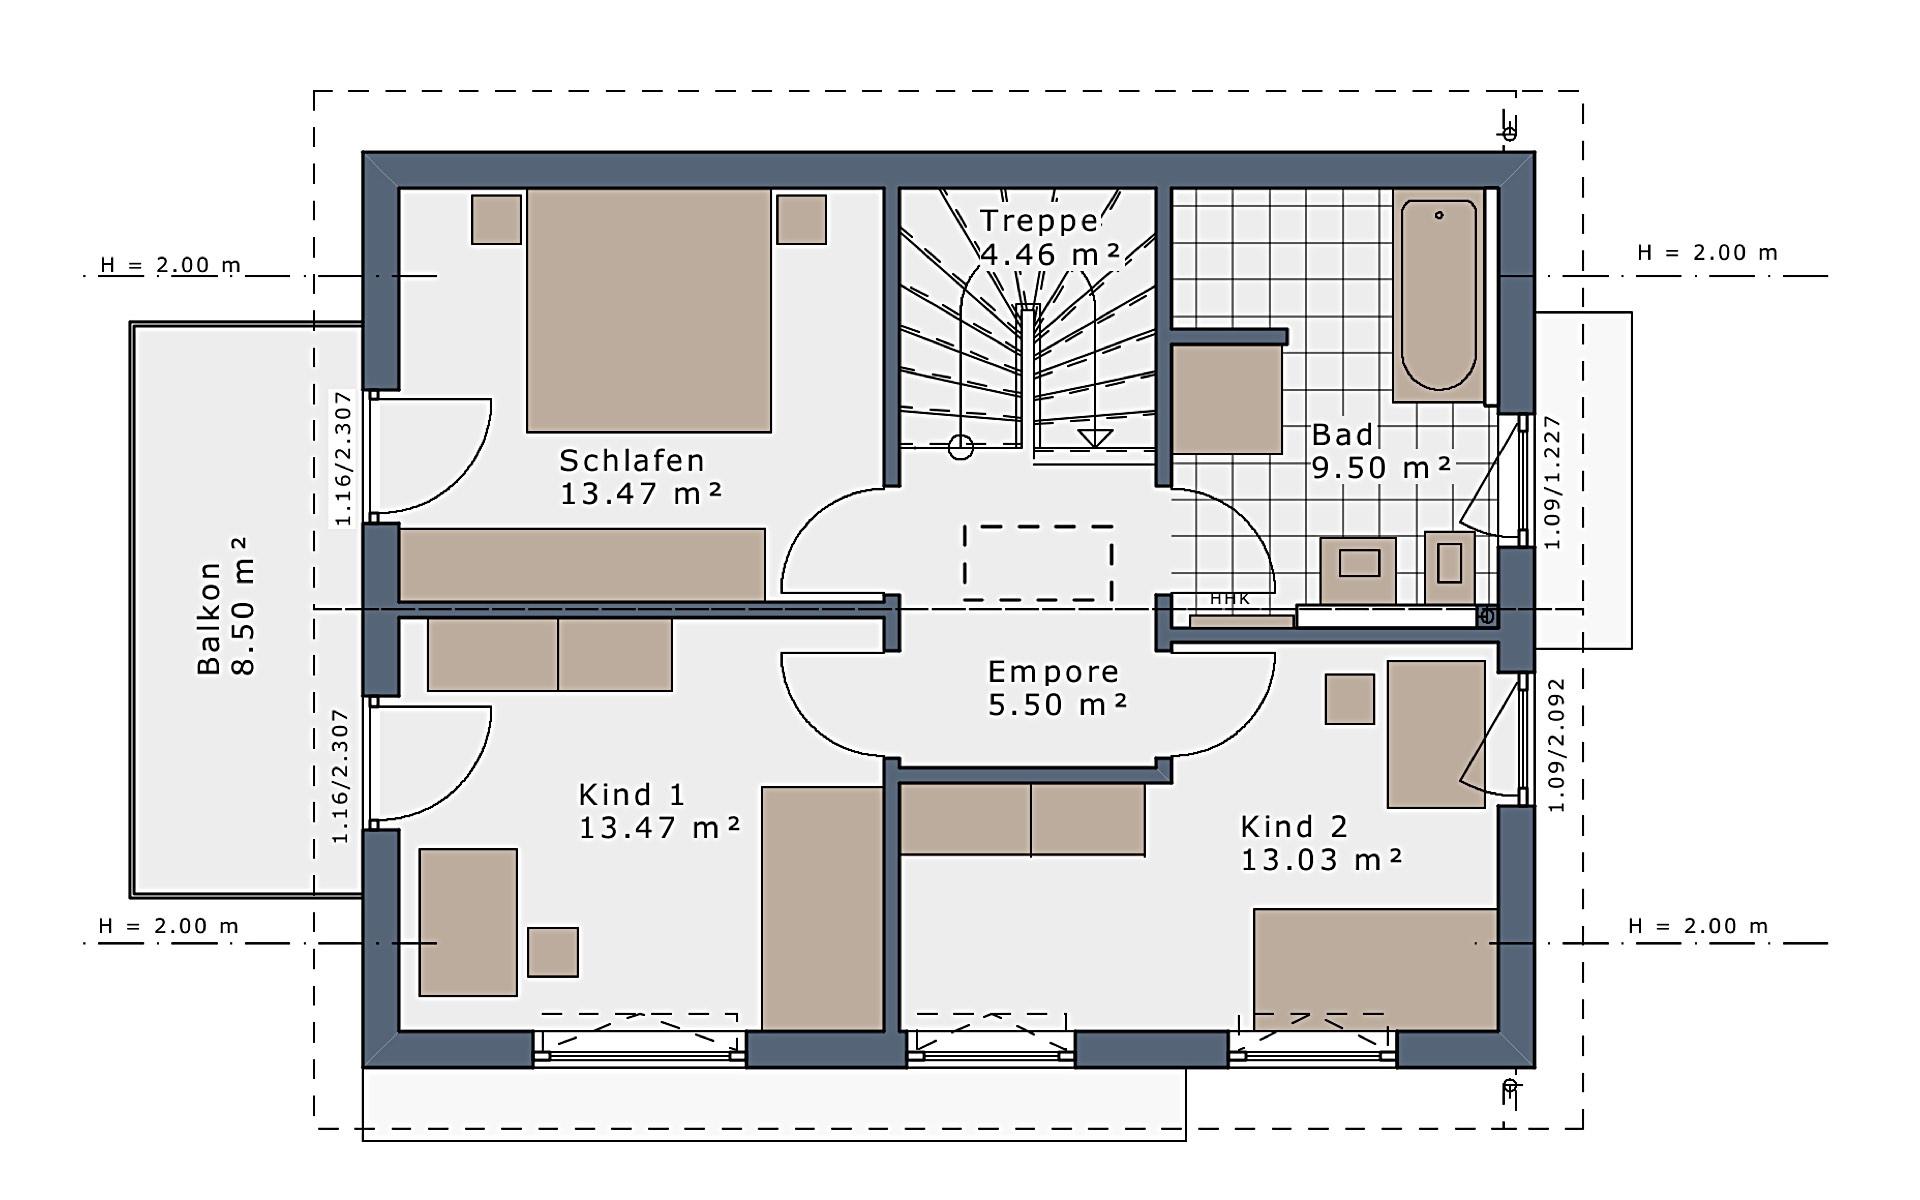 Dachgeschoss SmartSpace-E-120 E3 von Schwabenhaus GmbH & Co. KG